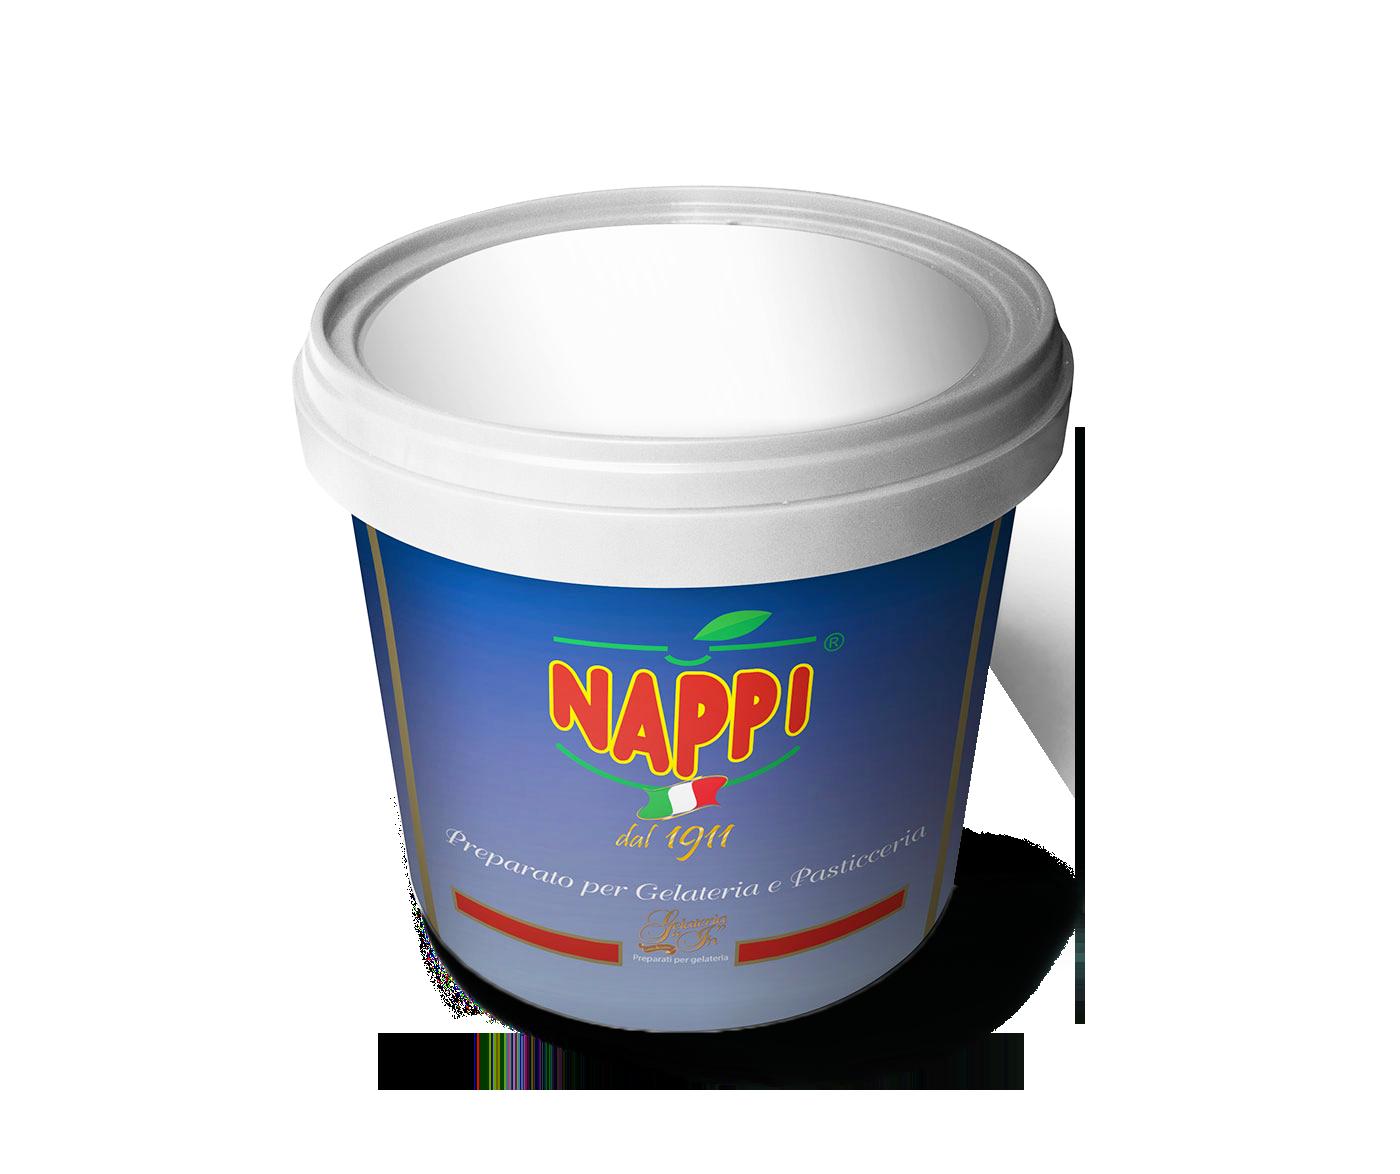 Nappi Pistachio **Sicilia** 3kg pail